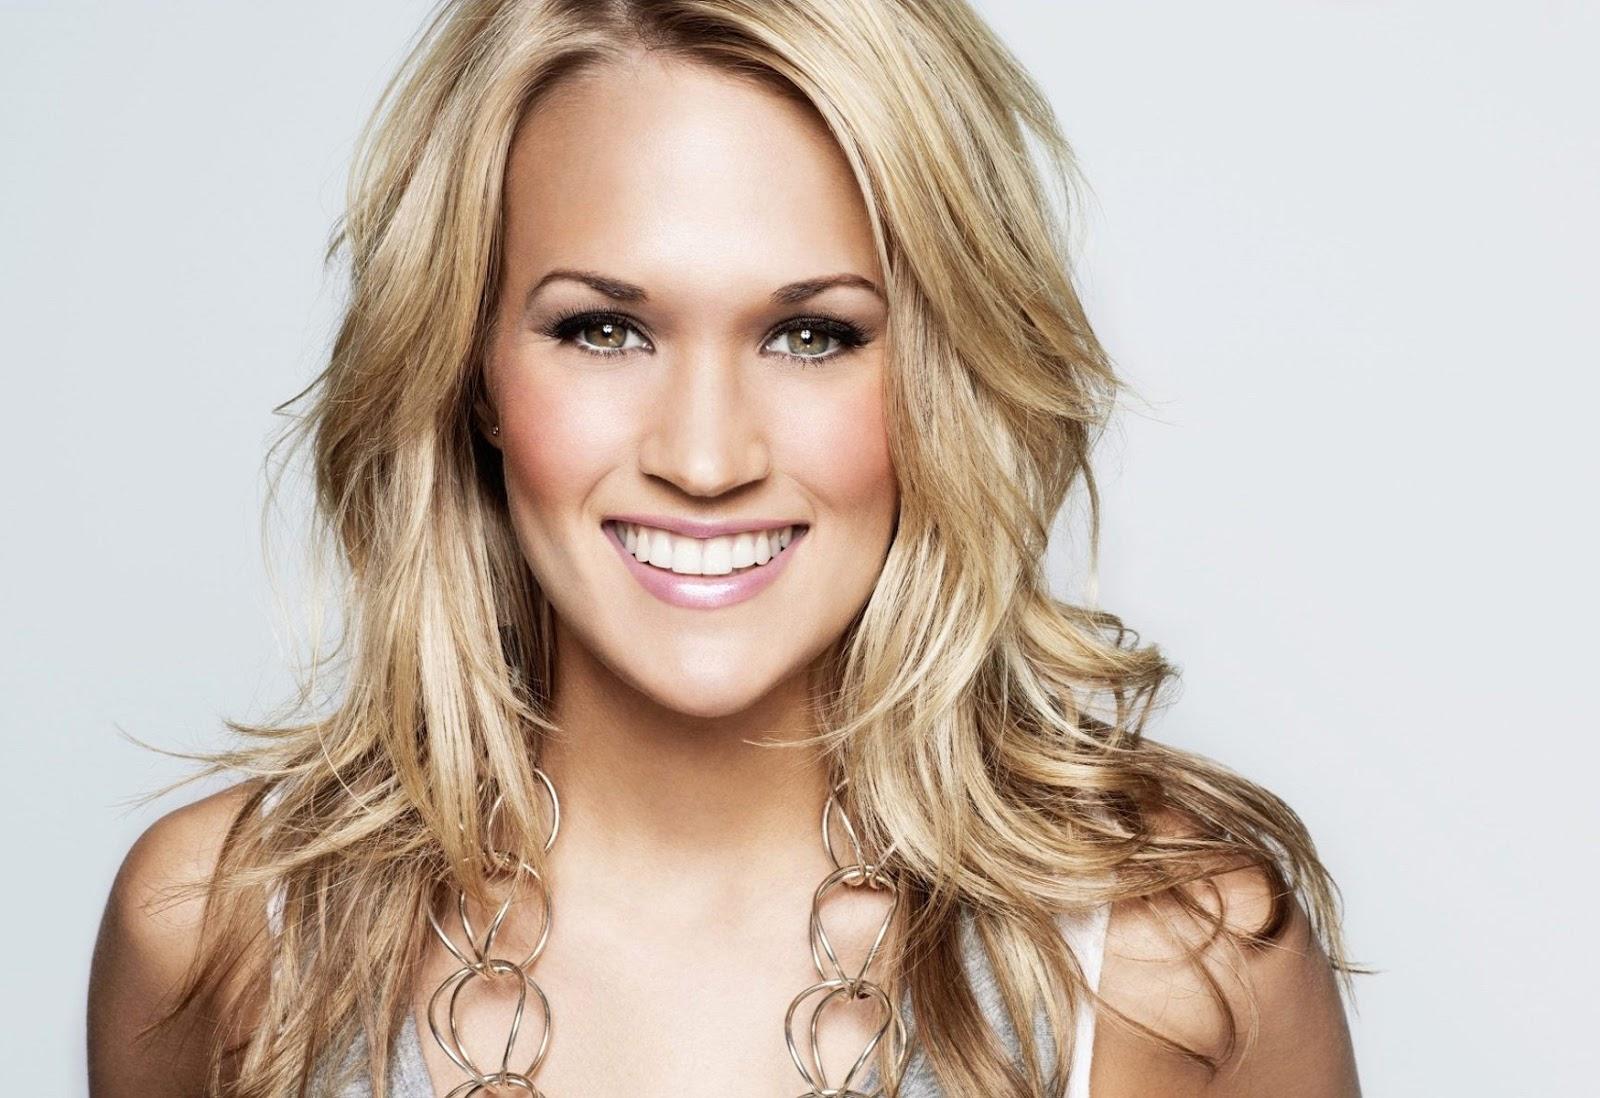 List Of Female Singers Top 10 List Best Country Music Singers In 2015